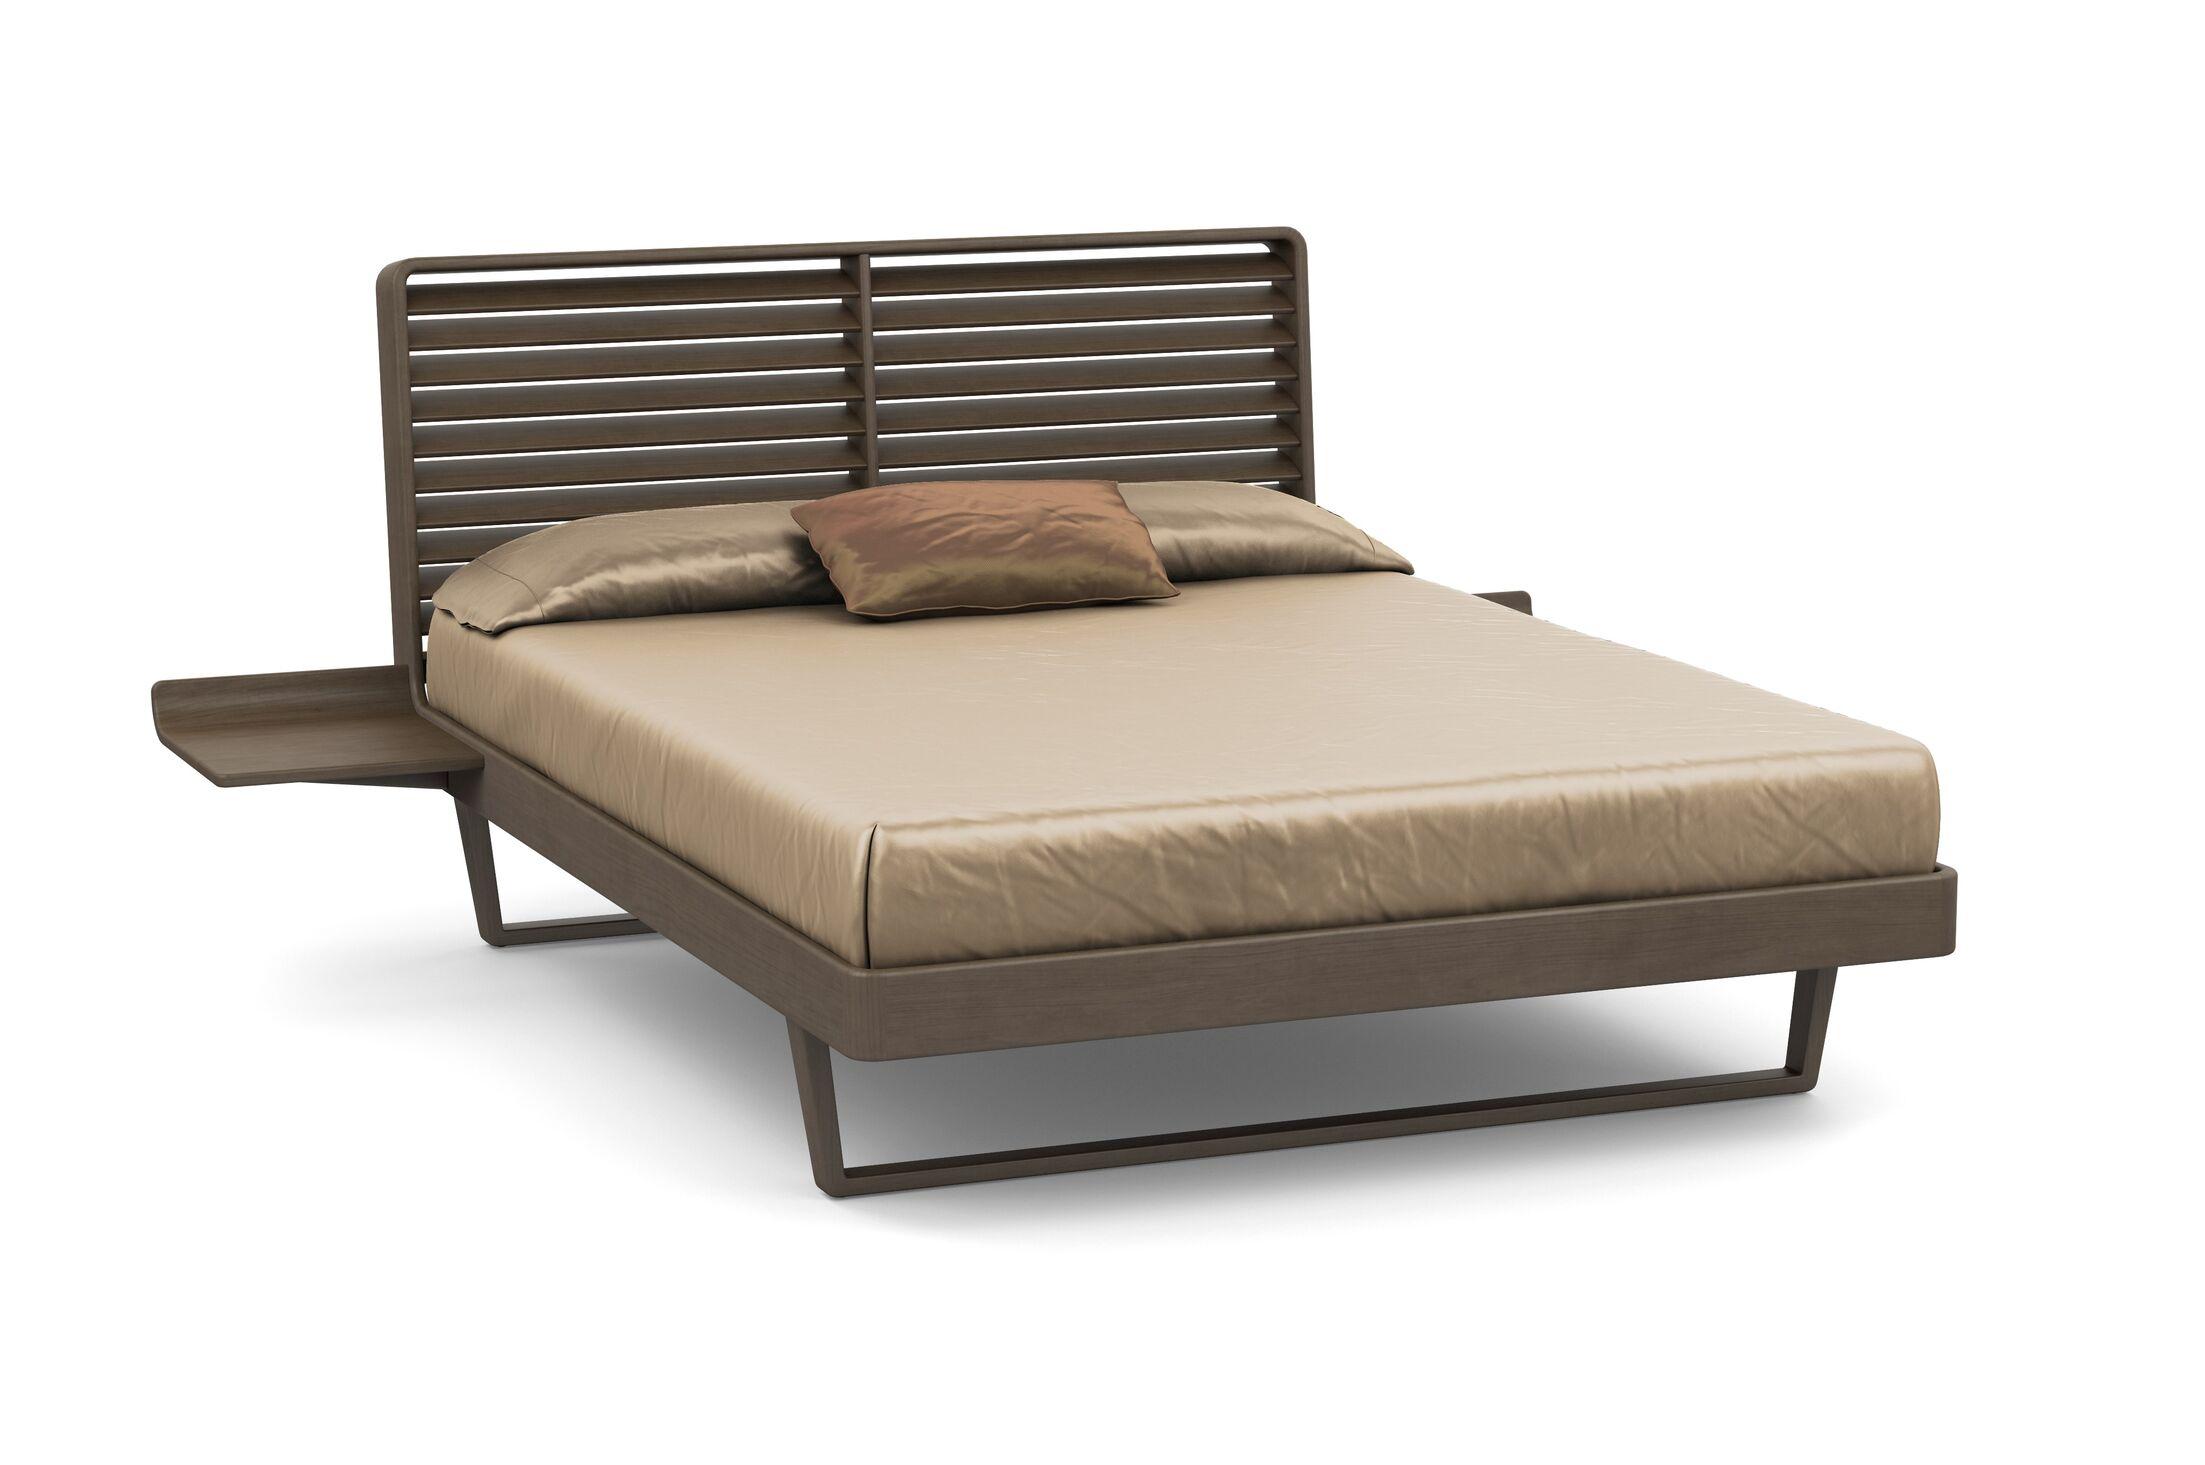 Contour Platform Bed Size: California King, Color: Taupe Ash